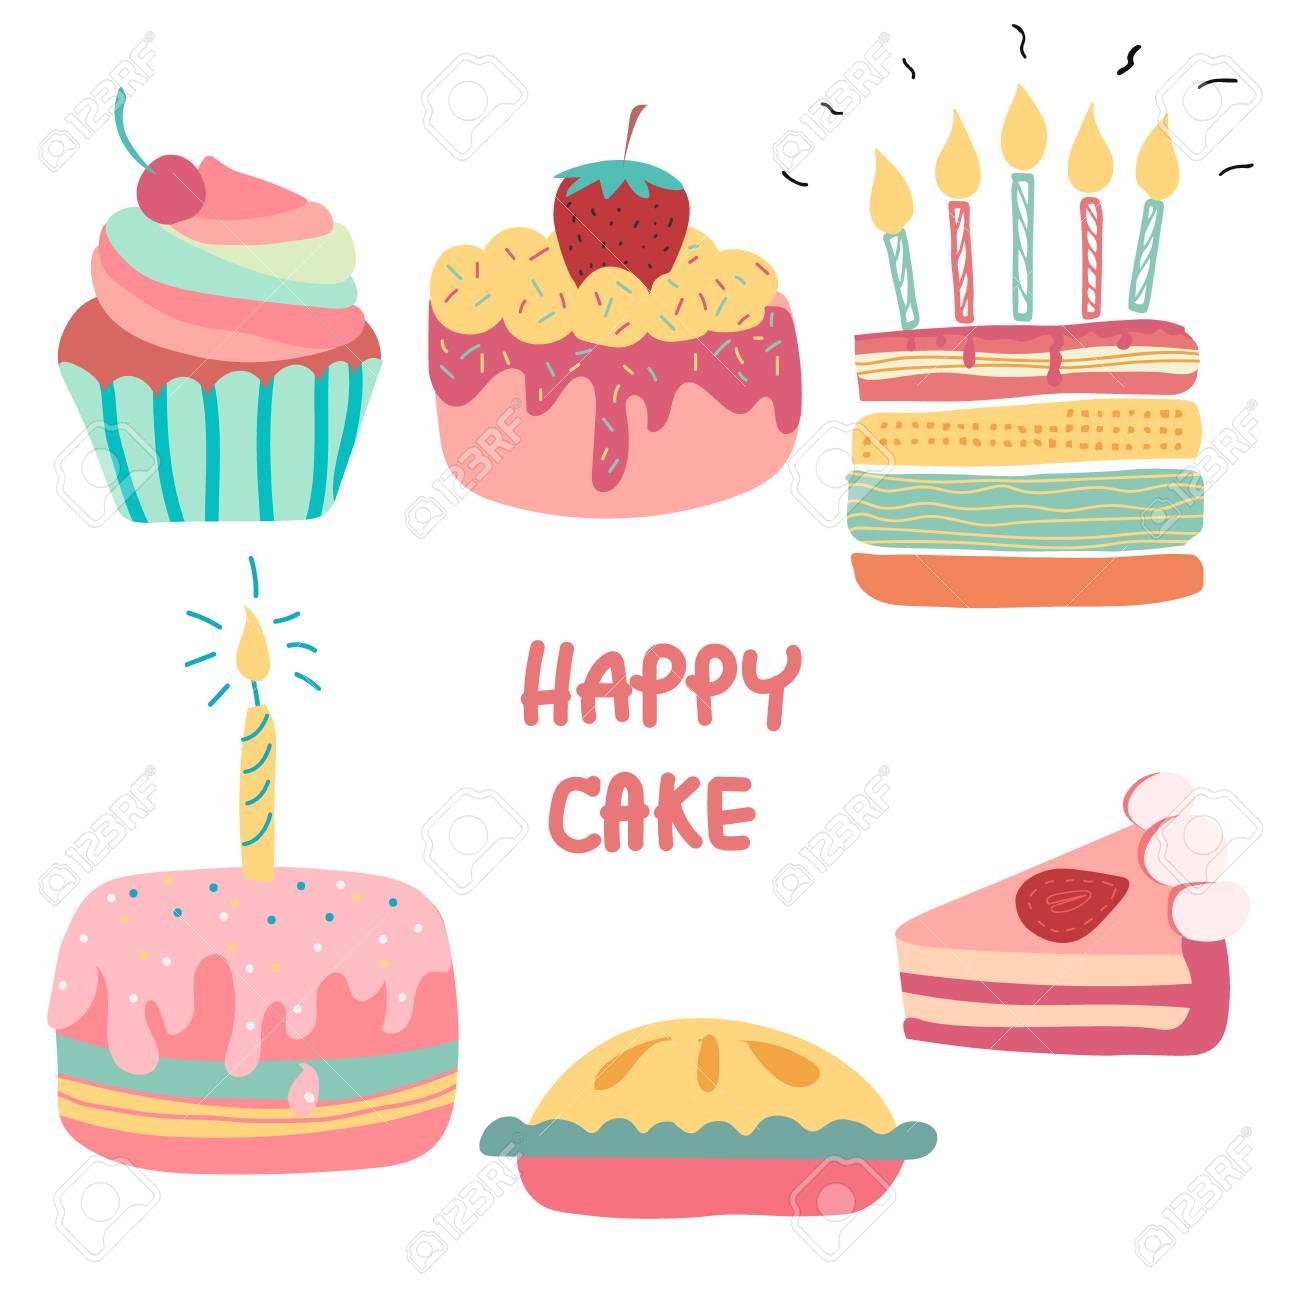 Outstanding Doodle Hand Drawn Rainbow Cute Birthday Cake Royalty Free Cliparts Funny Birthday Cards Online Elaedamsfinfo